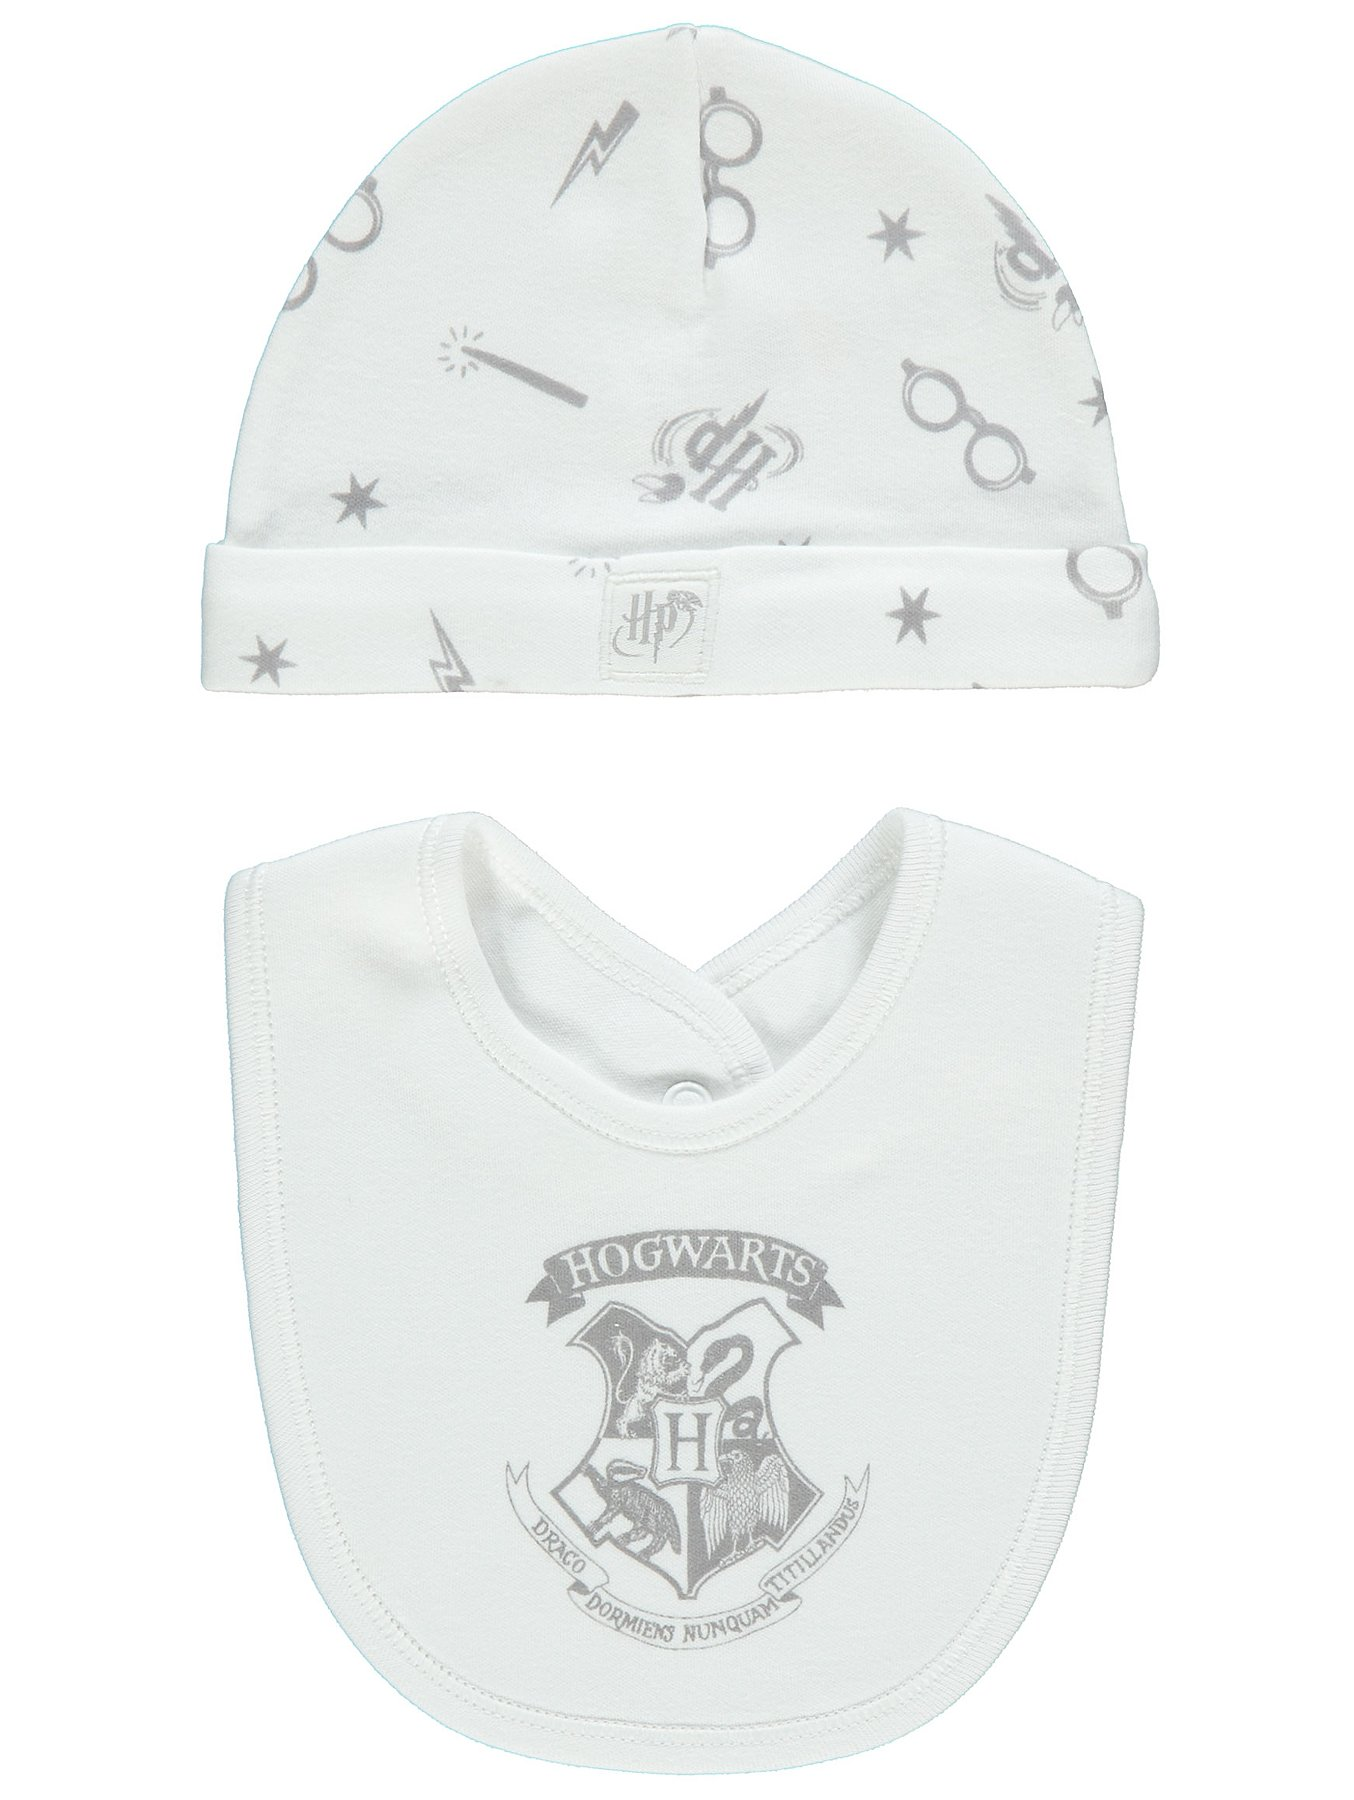 278374b0d Harry Potter Sleepsuit, Bib and Hat Set | Baby | George